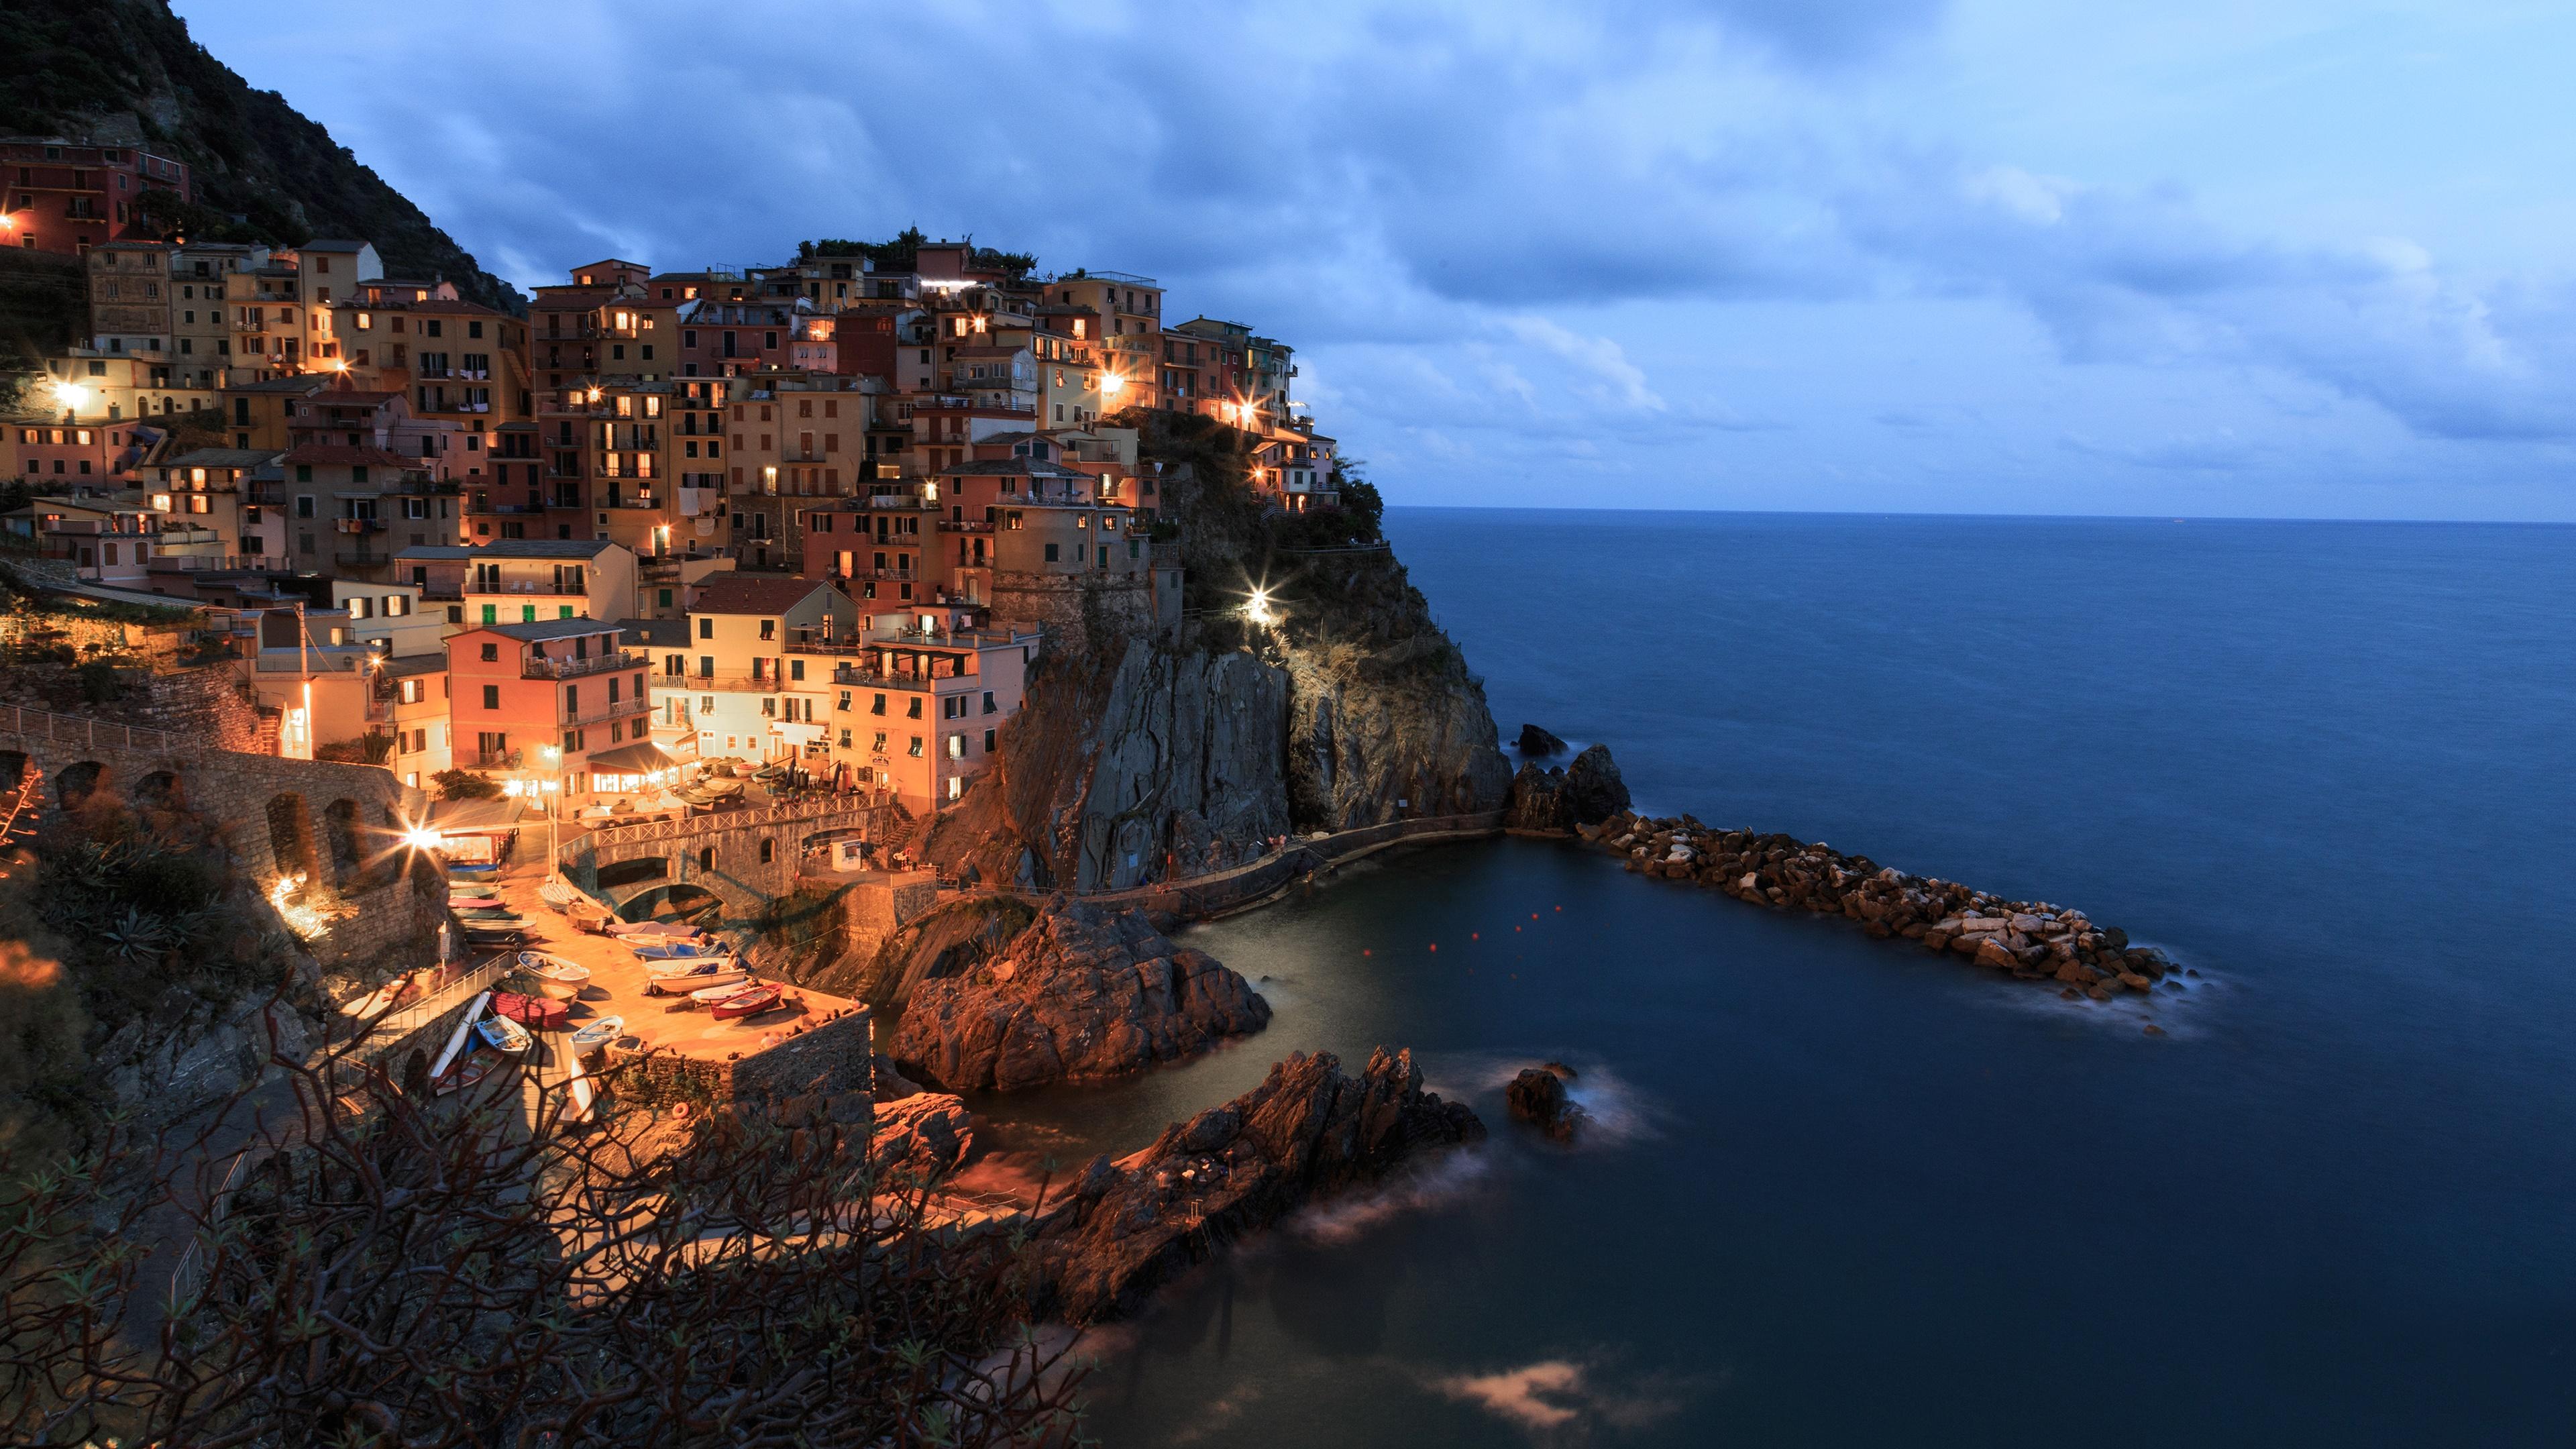 Manarola and the Ligurian Sea wallpaper